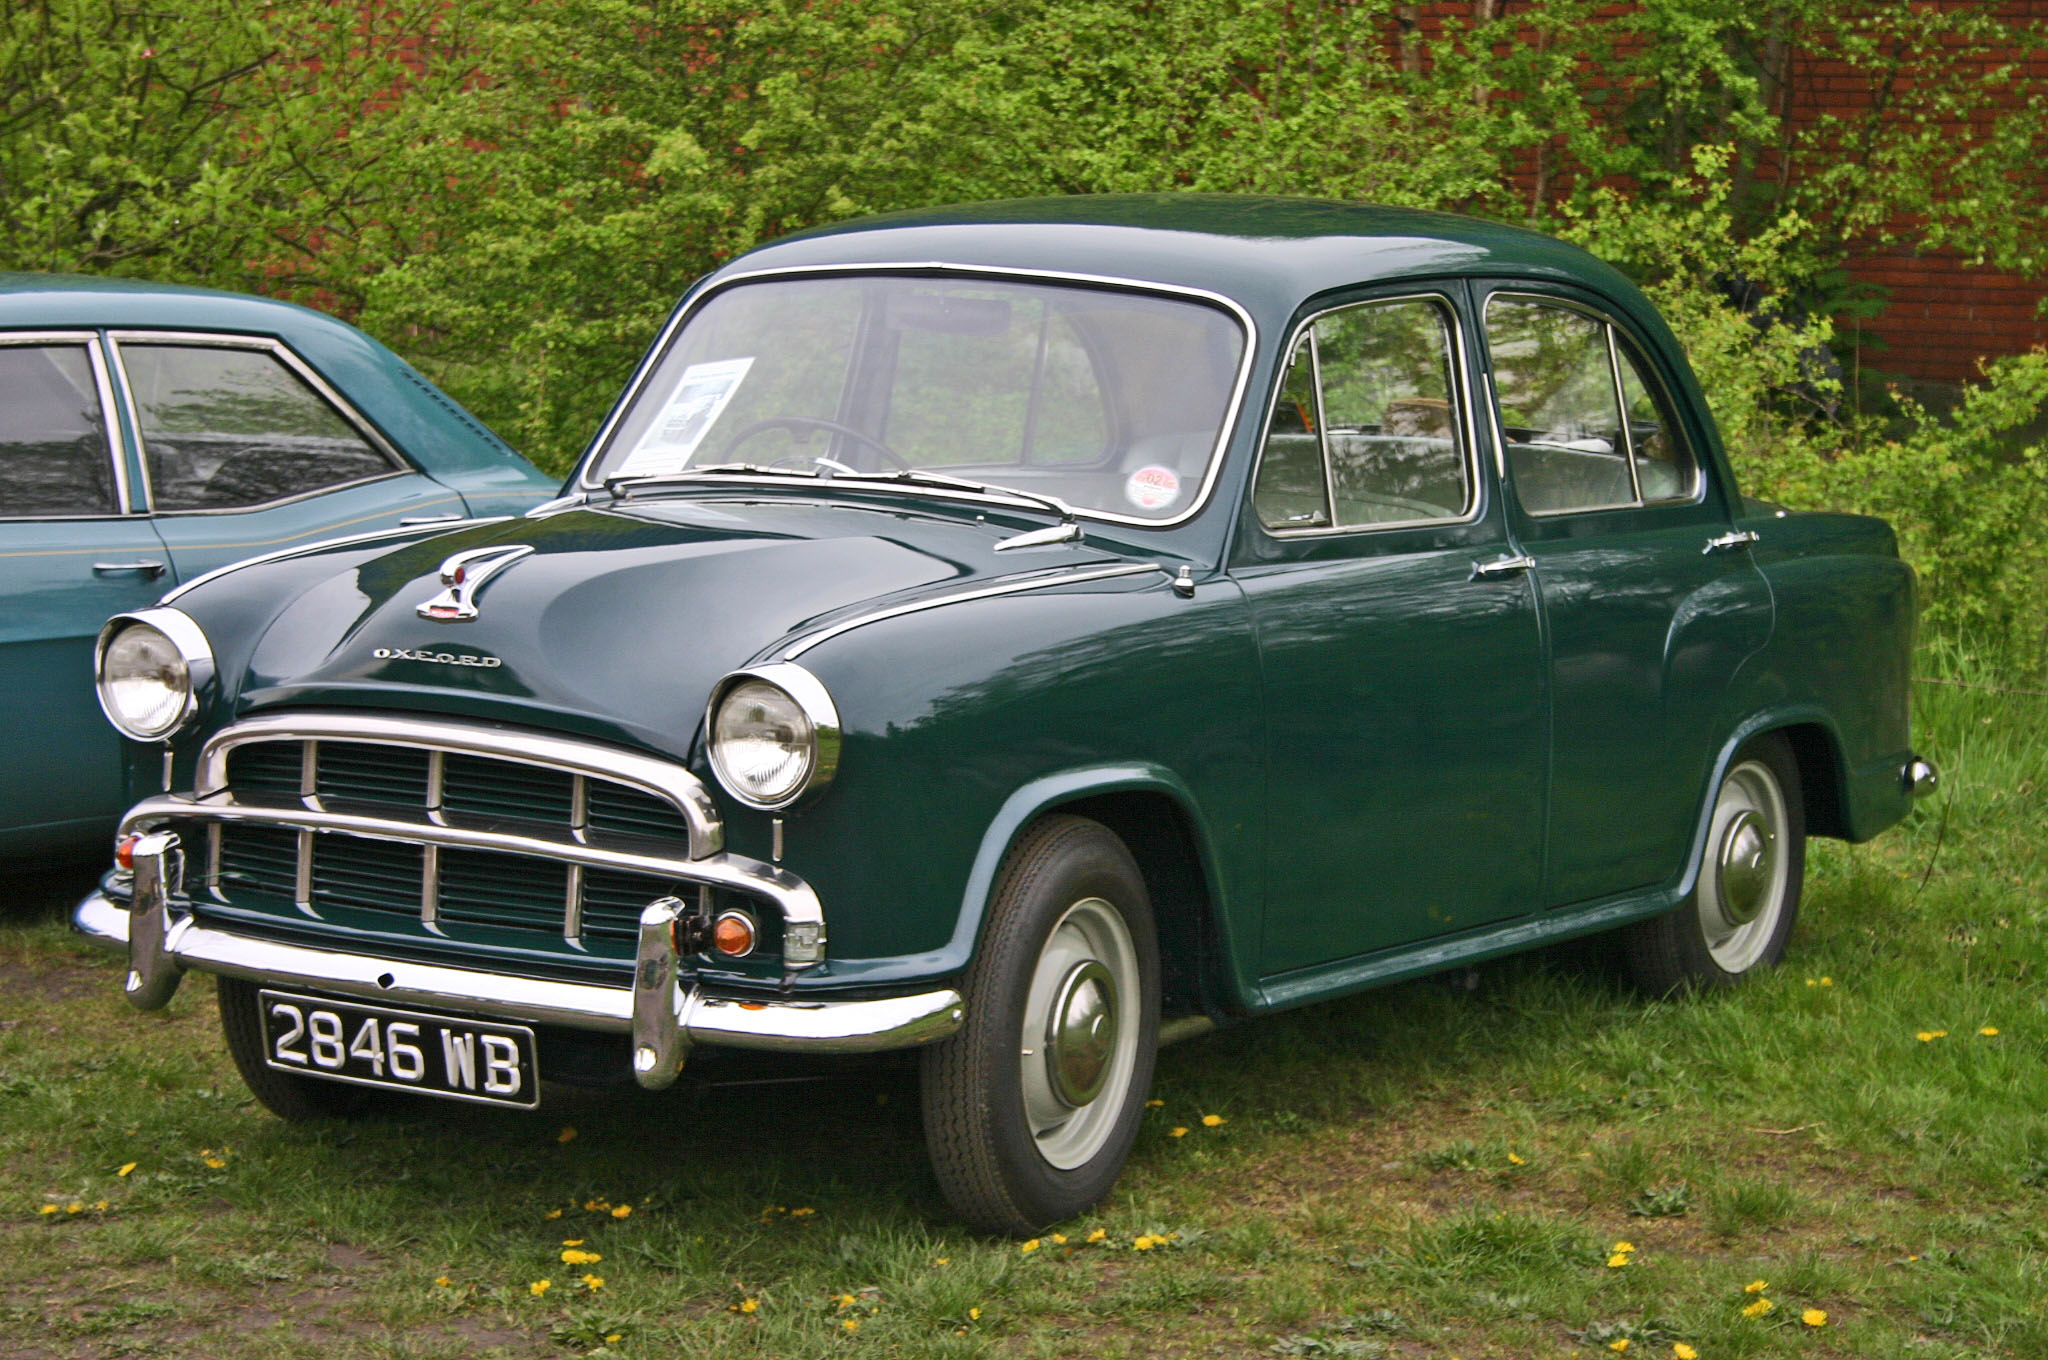 morris oxford picture   6   reviews  news  specs  buy car